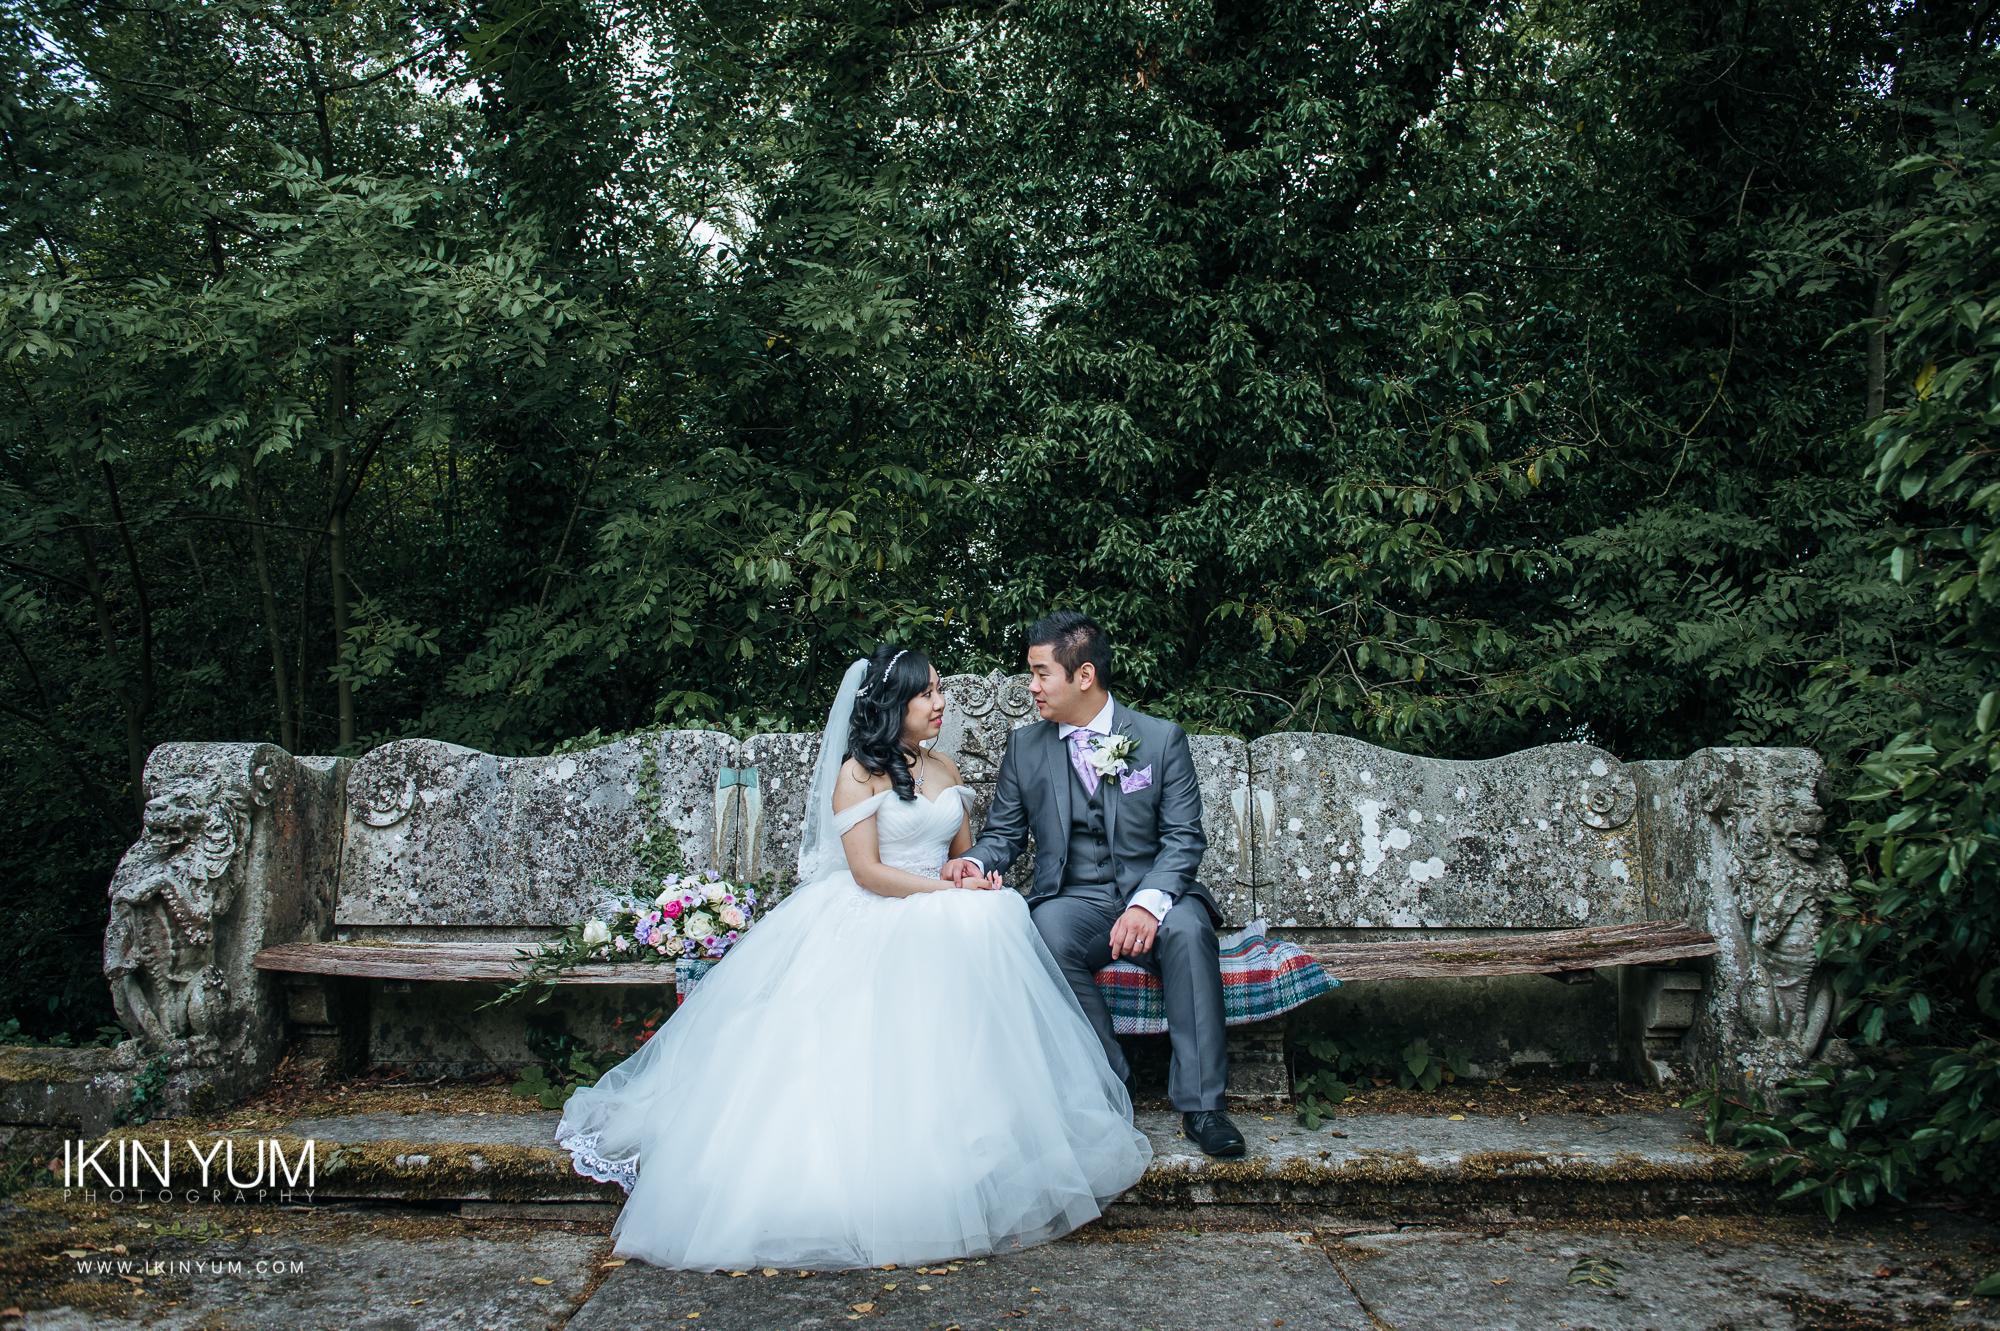 Hampton Manor Wedding - Ikin Yum Photography -103.jpg